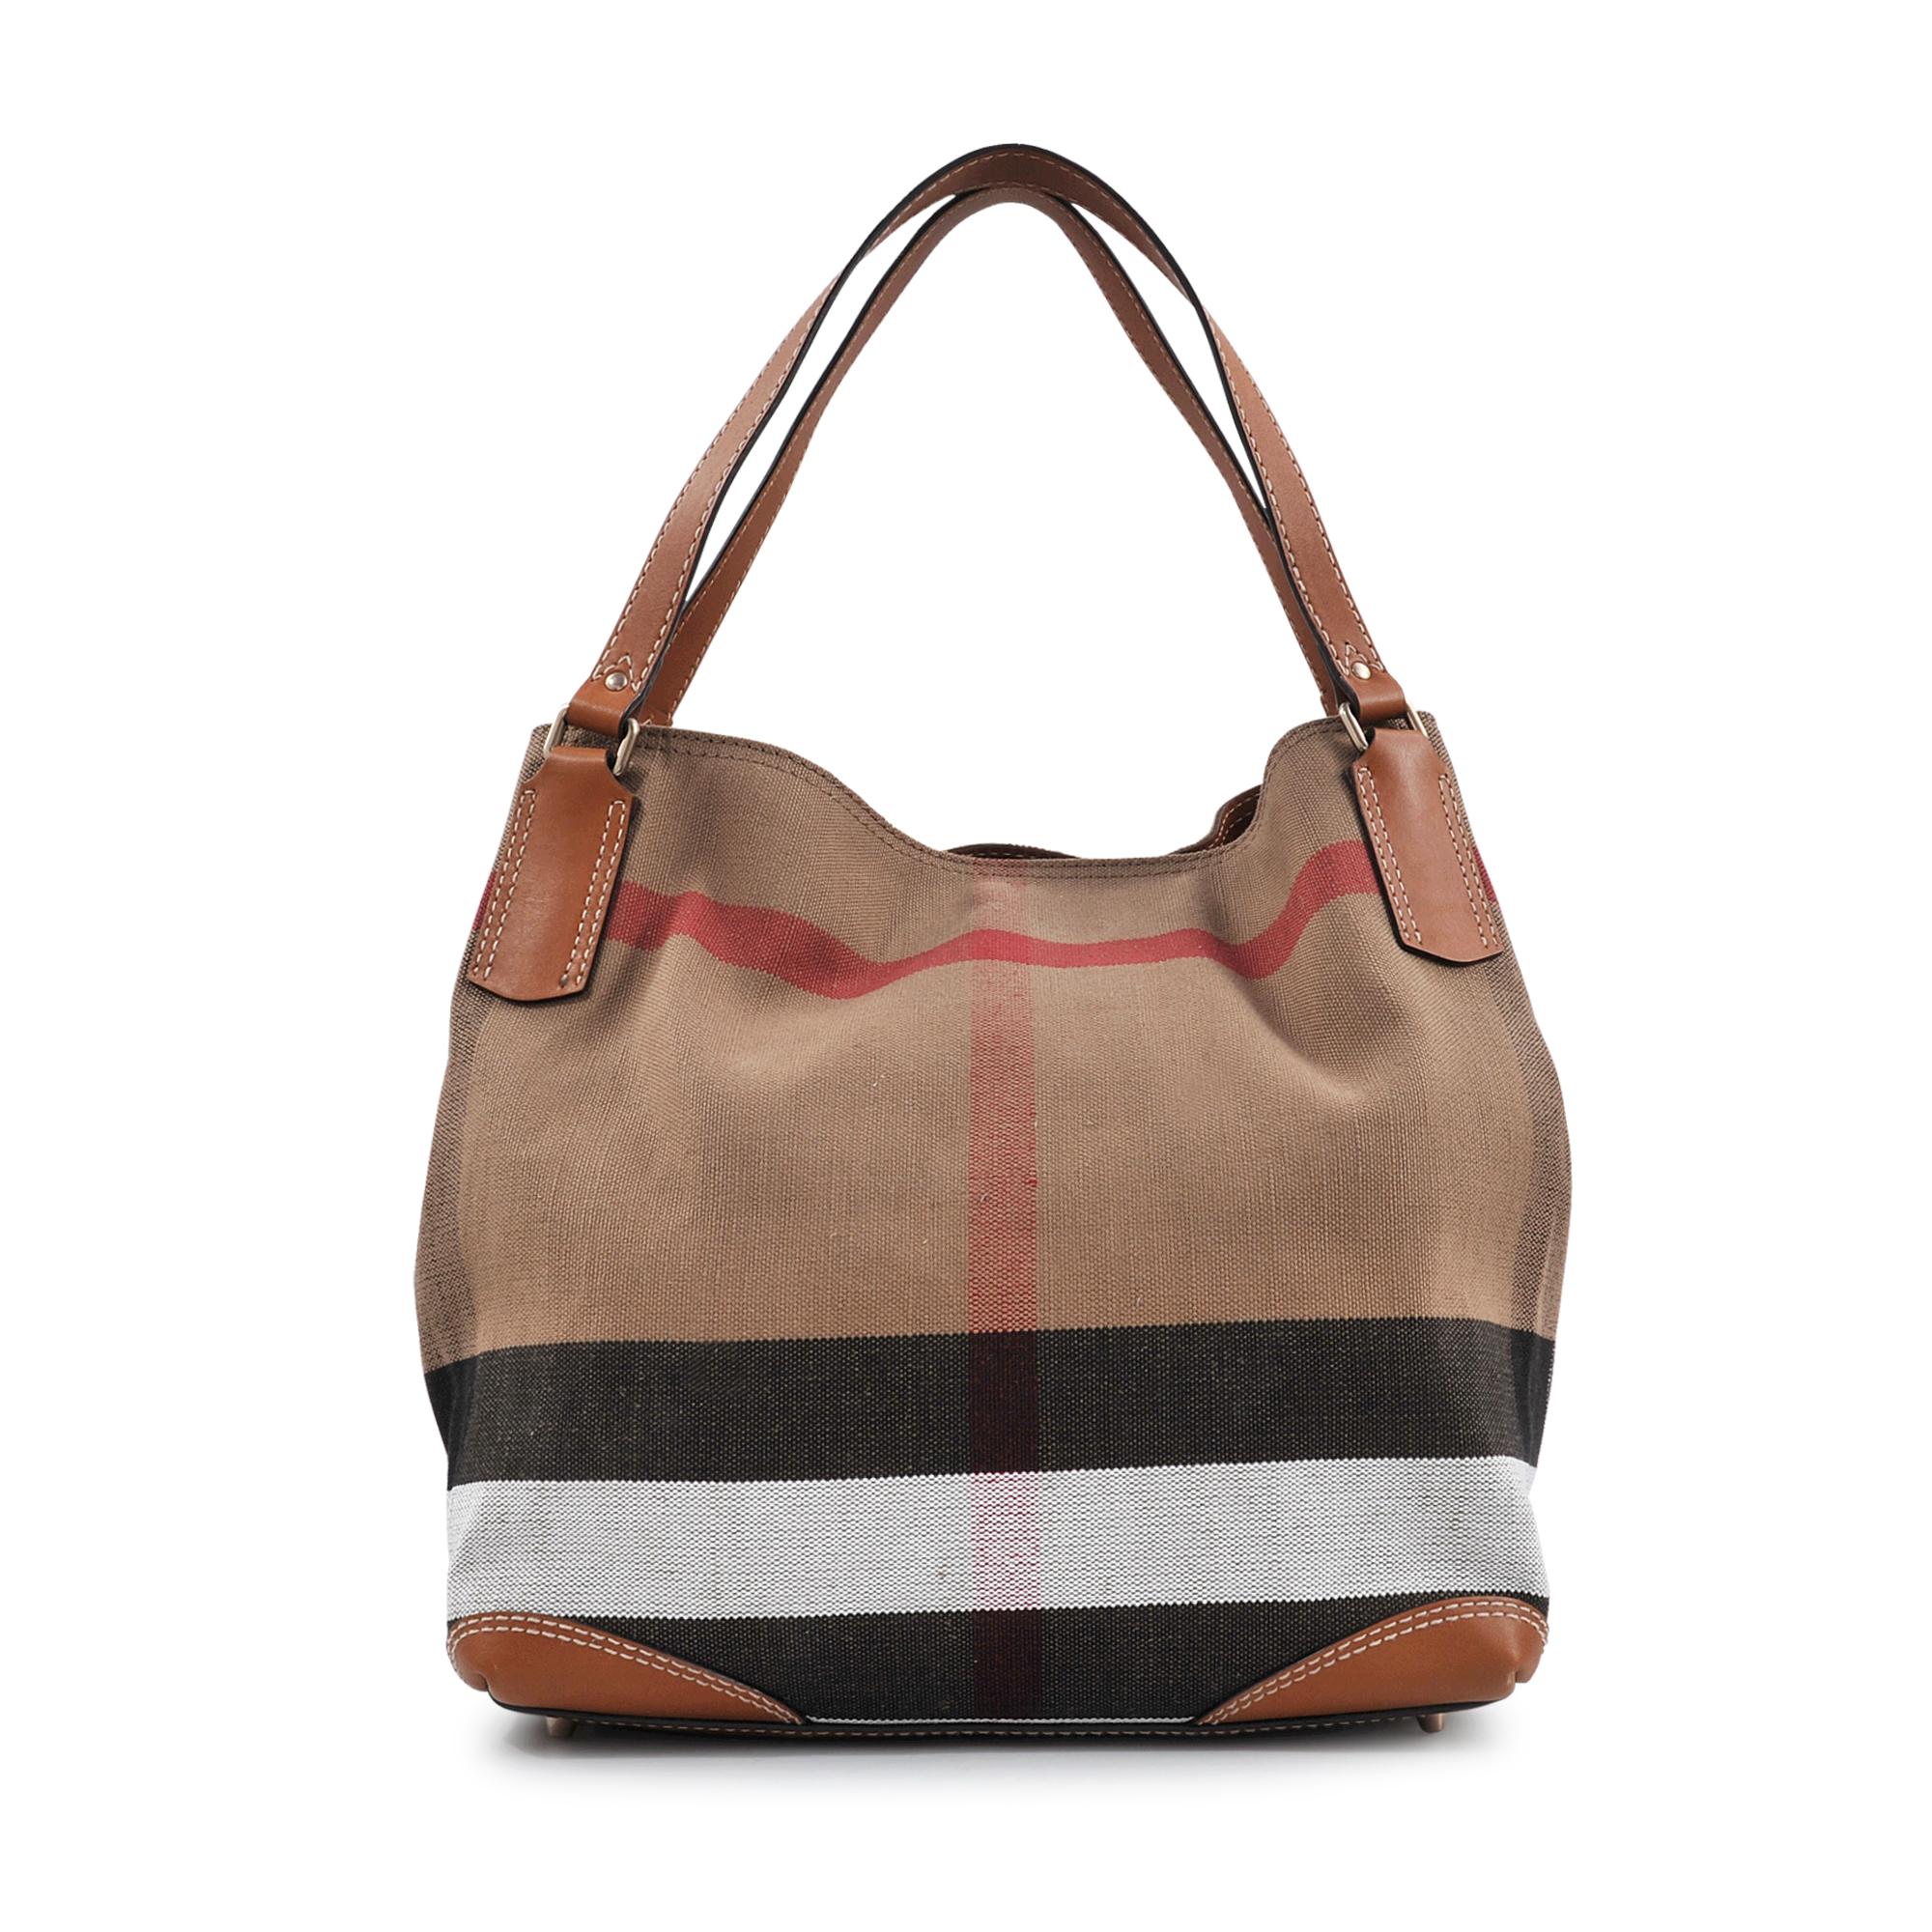 6ef9b750b Burberry Sm Maidstone Brit Canvas Bag in Brown - Lyst